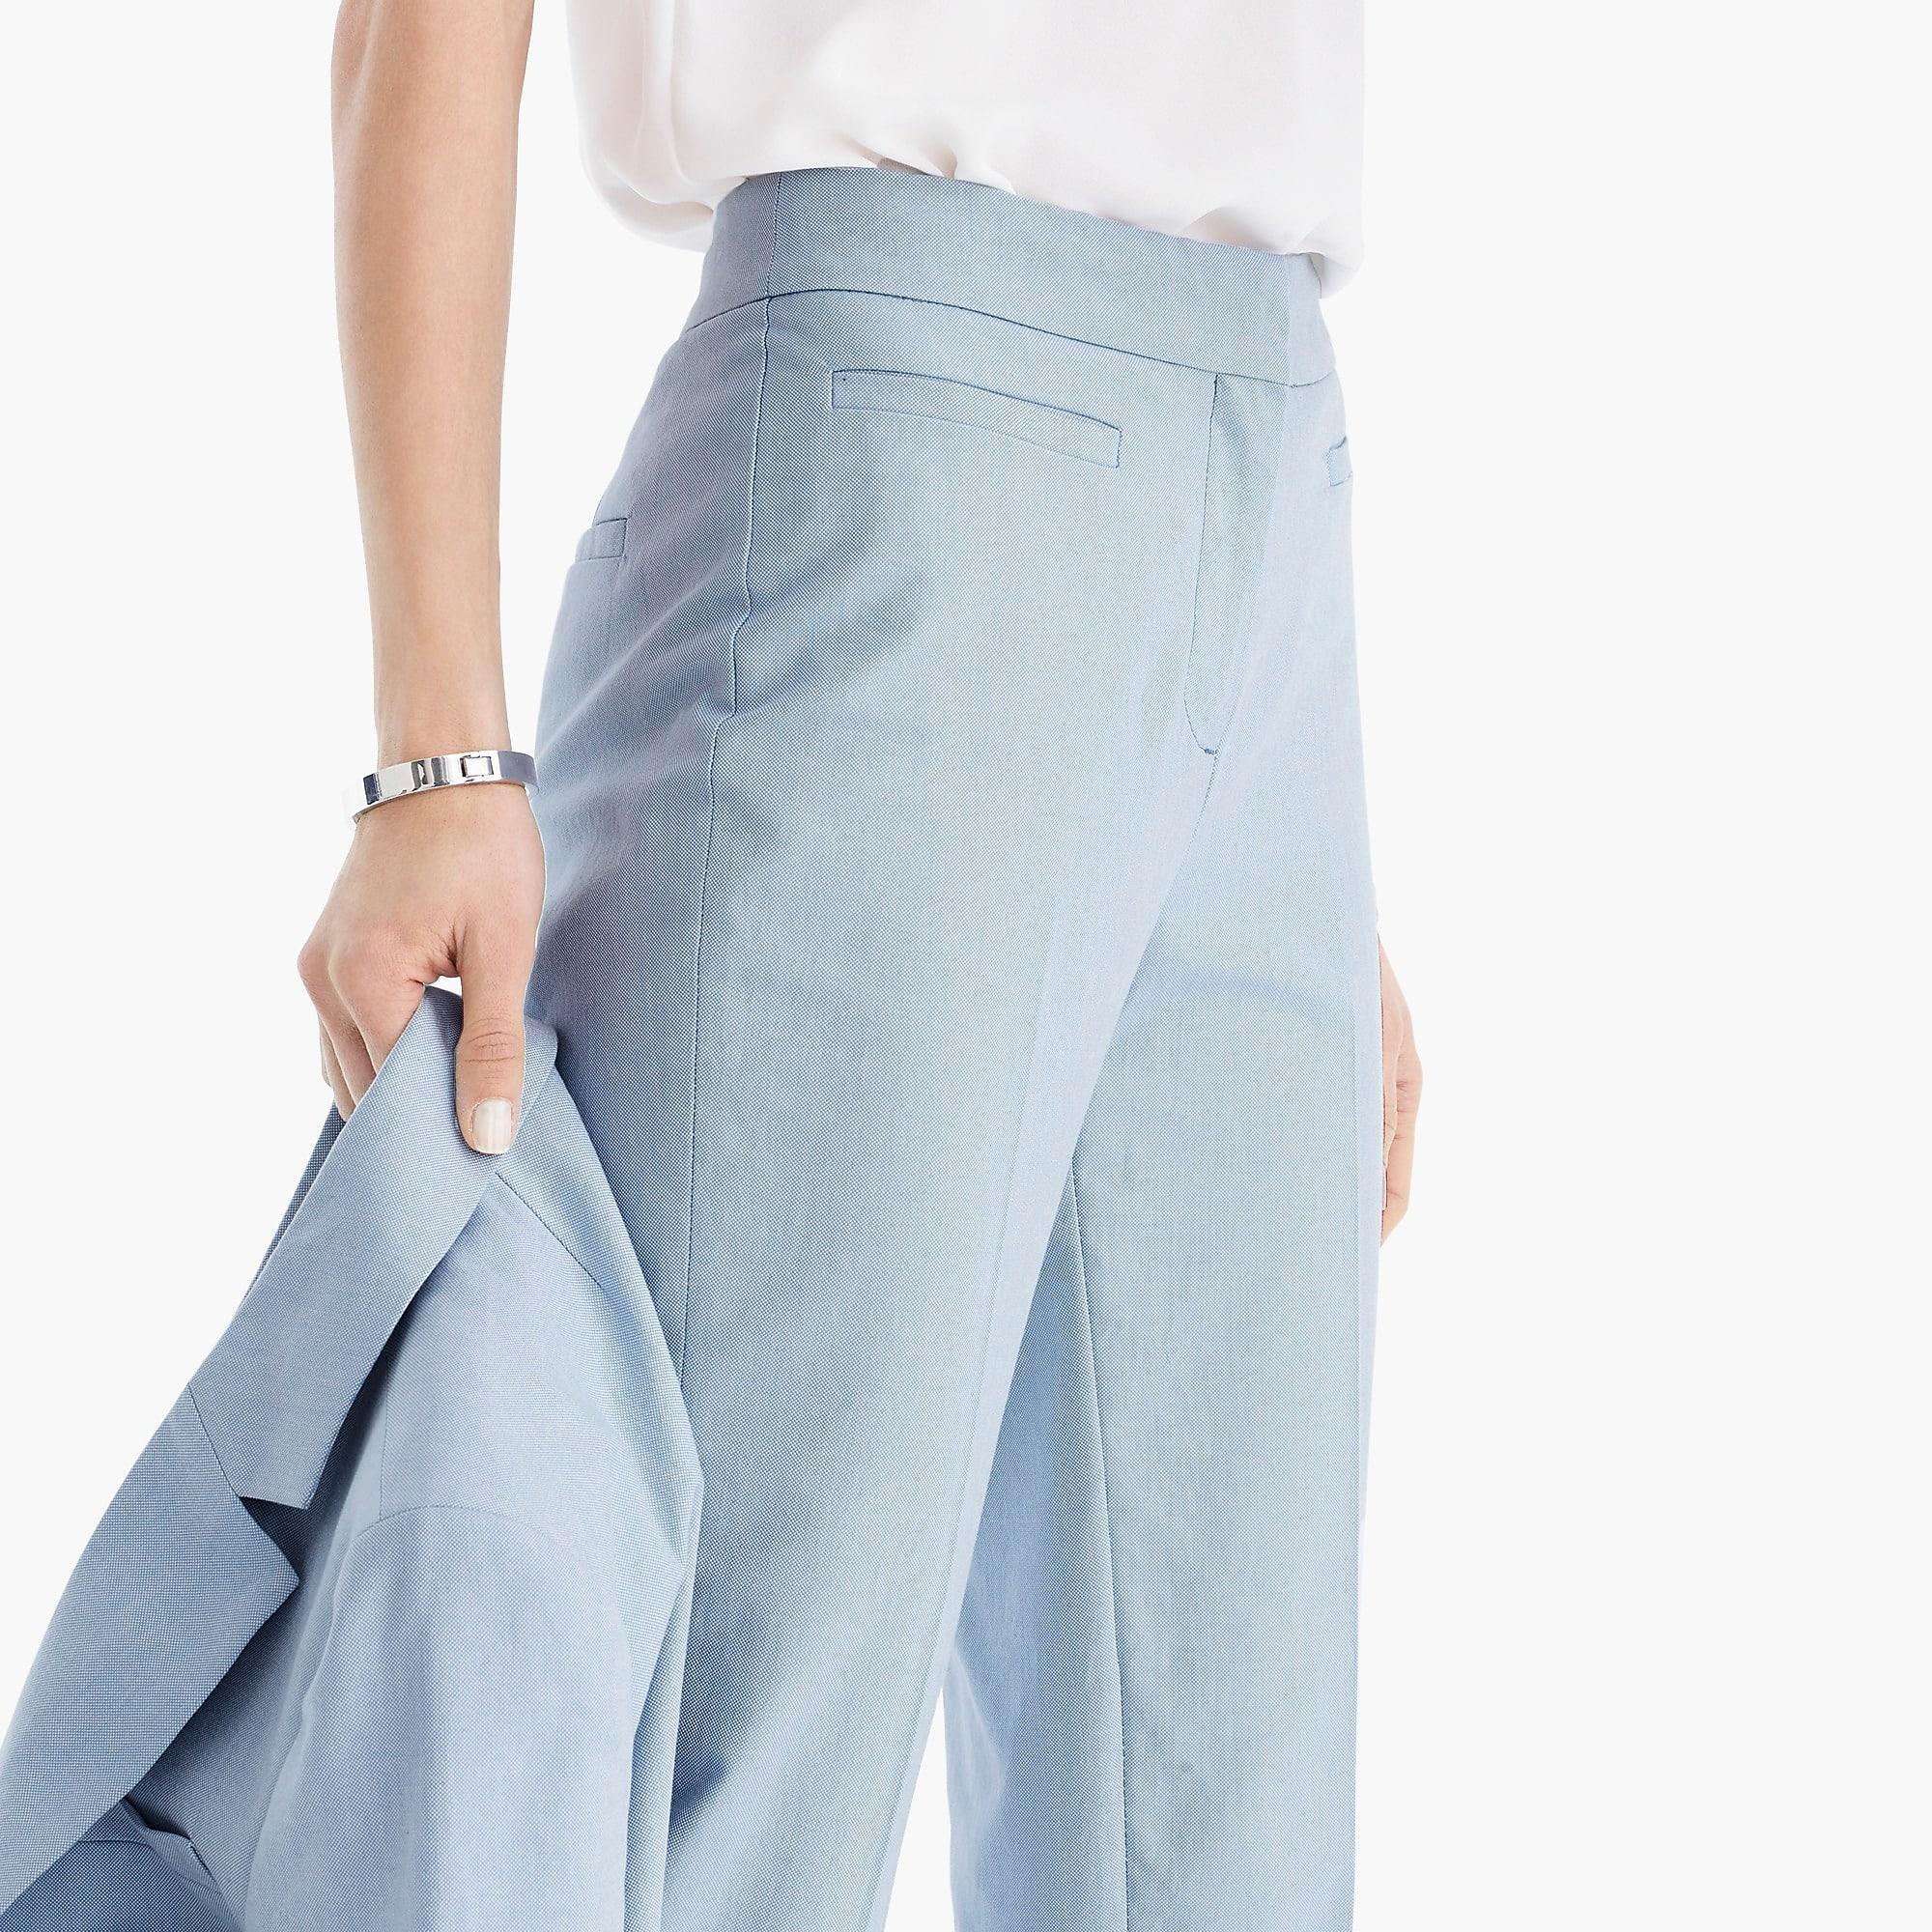 dd9f699cf7 J.Crew French Girl Pant In Italian Cotton in Blue - Lyst